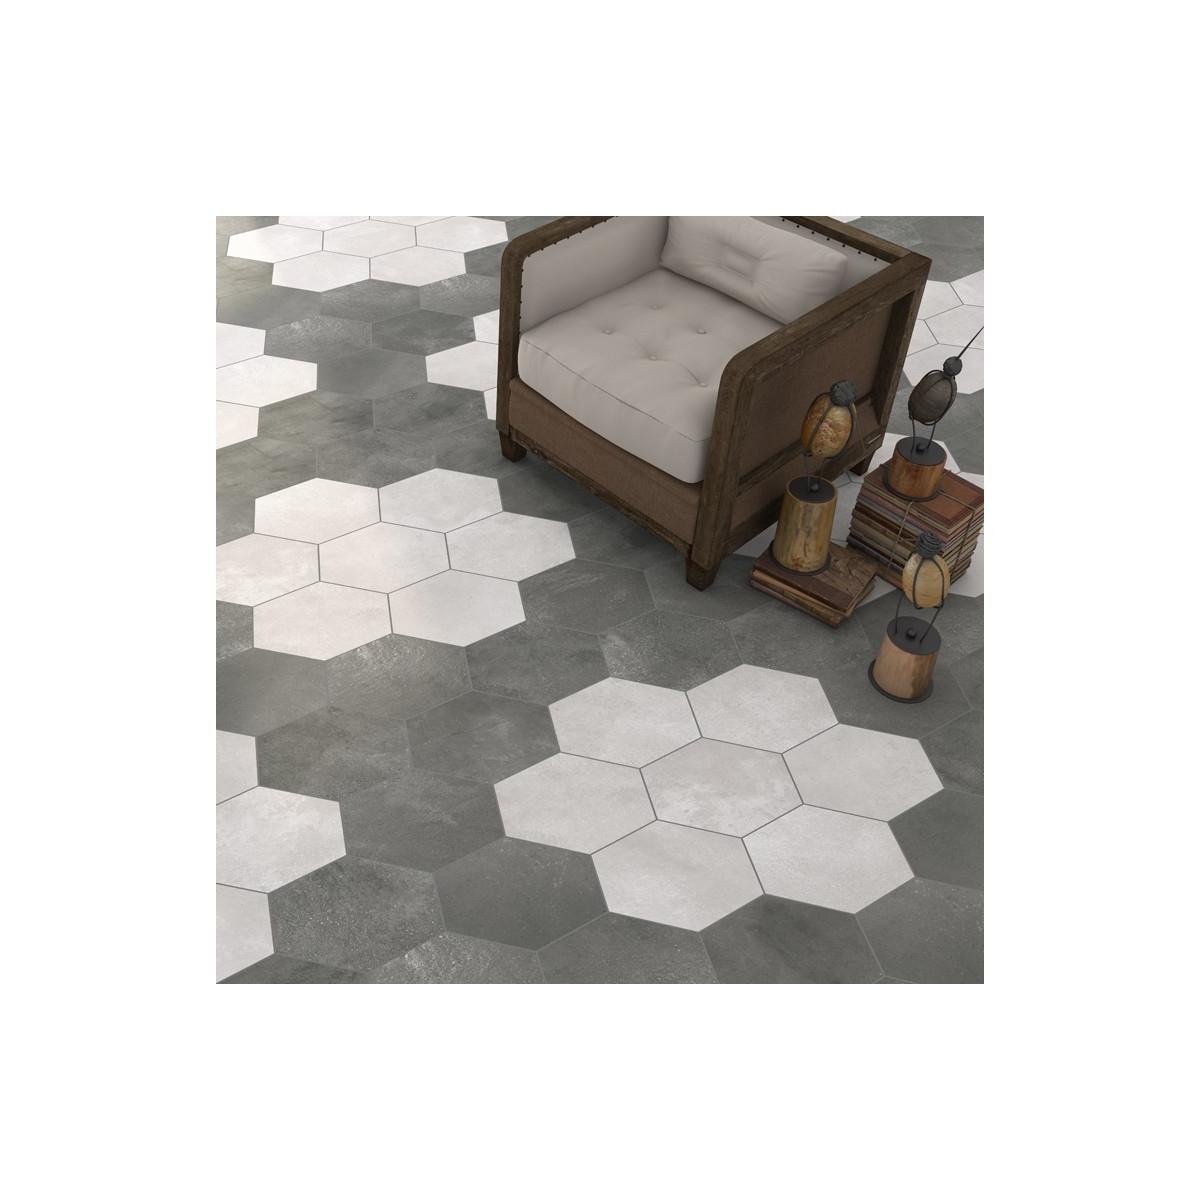 Rift Cemento Hexagonal Pavimento porcelánico forma de hexágono